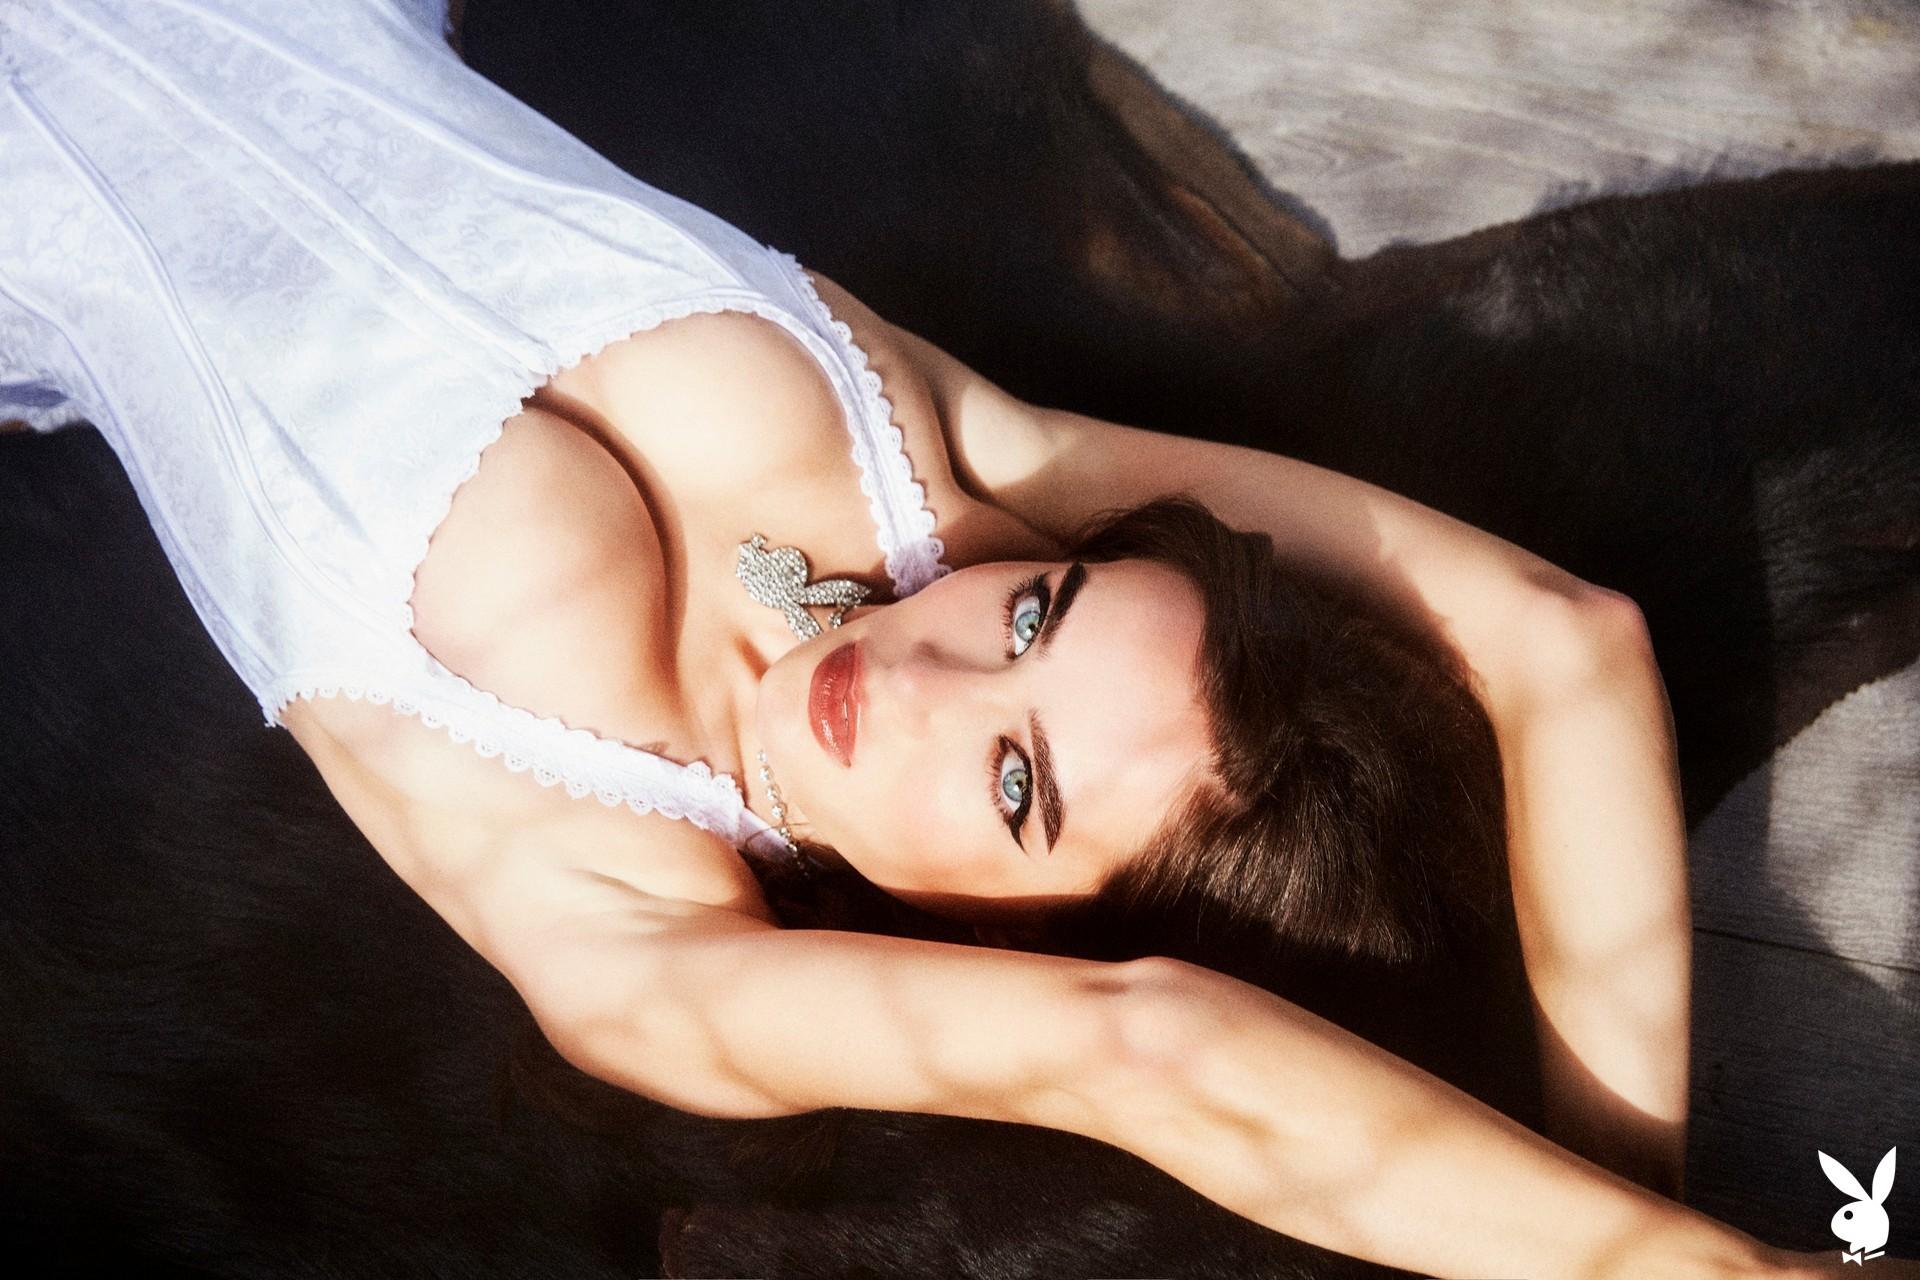 The Road To Lana Rhoades Playboy Plus (11)